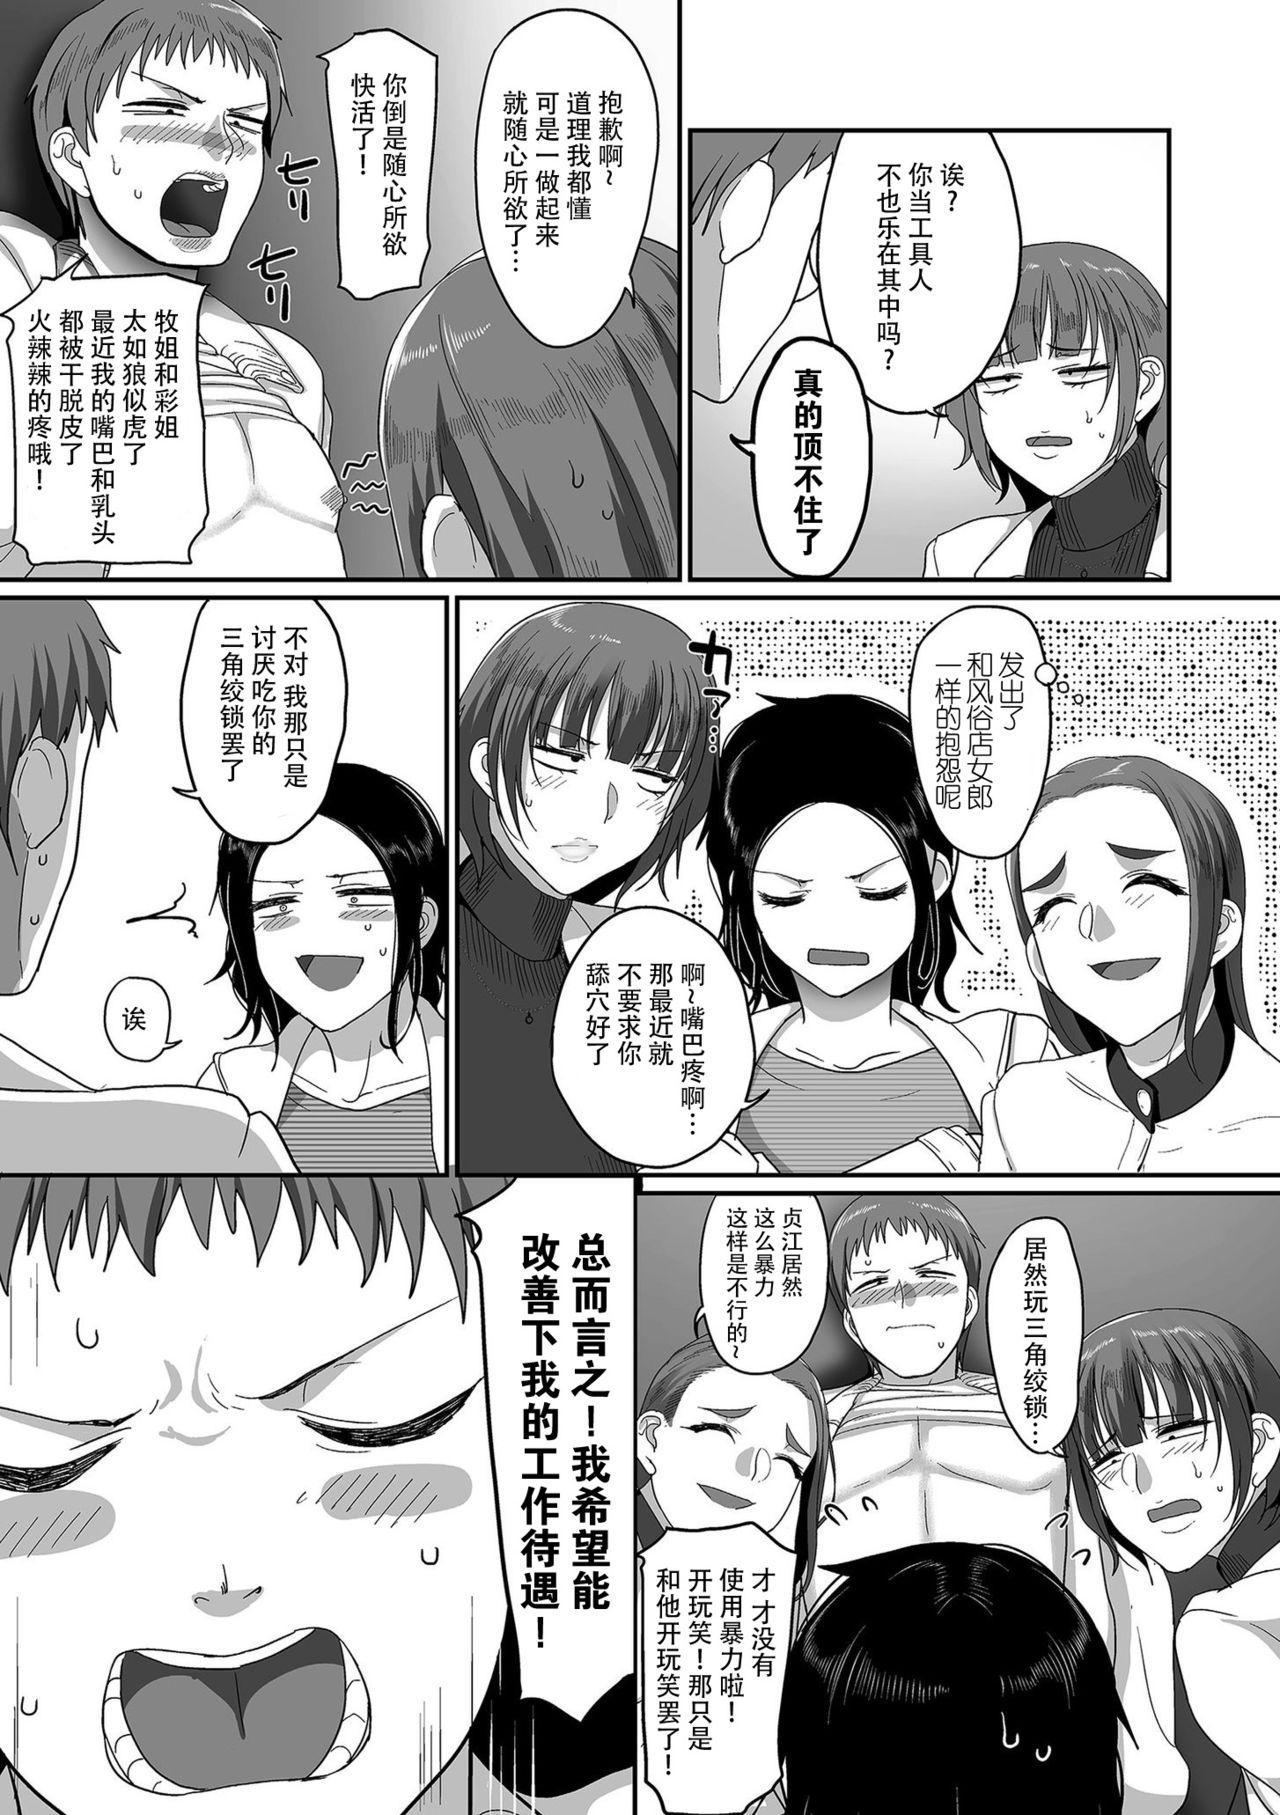 [Yamamoto Zenzen] S-ken K-shi Shakaijin Joshi Volleyball Circle no Jijou 4 | S县K市民间女子排球队的故事4 (COMIC KURiBERON DUMA 2020-03 Vol. 19) [Chinese] [listen to yourself×swordman联合汉化] 4